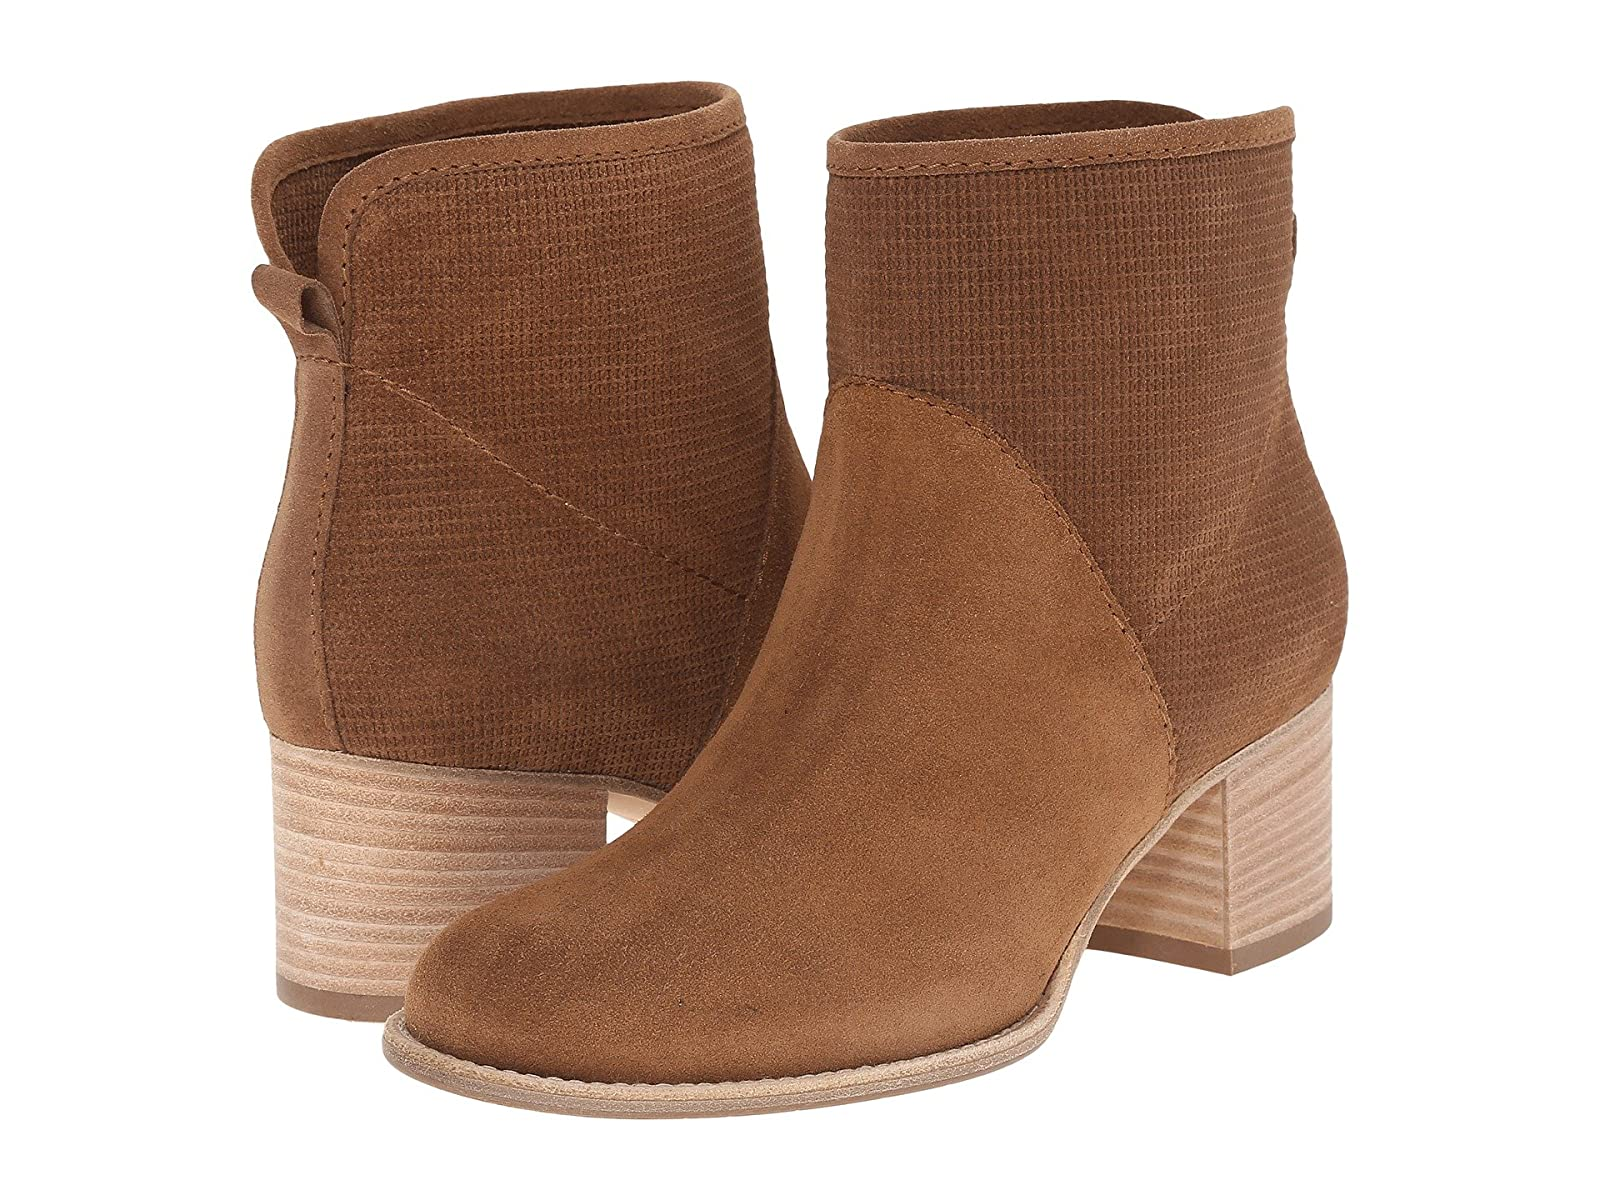 Aquatalia TriciaCheap and distinctive eye-catching shoes